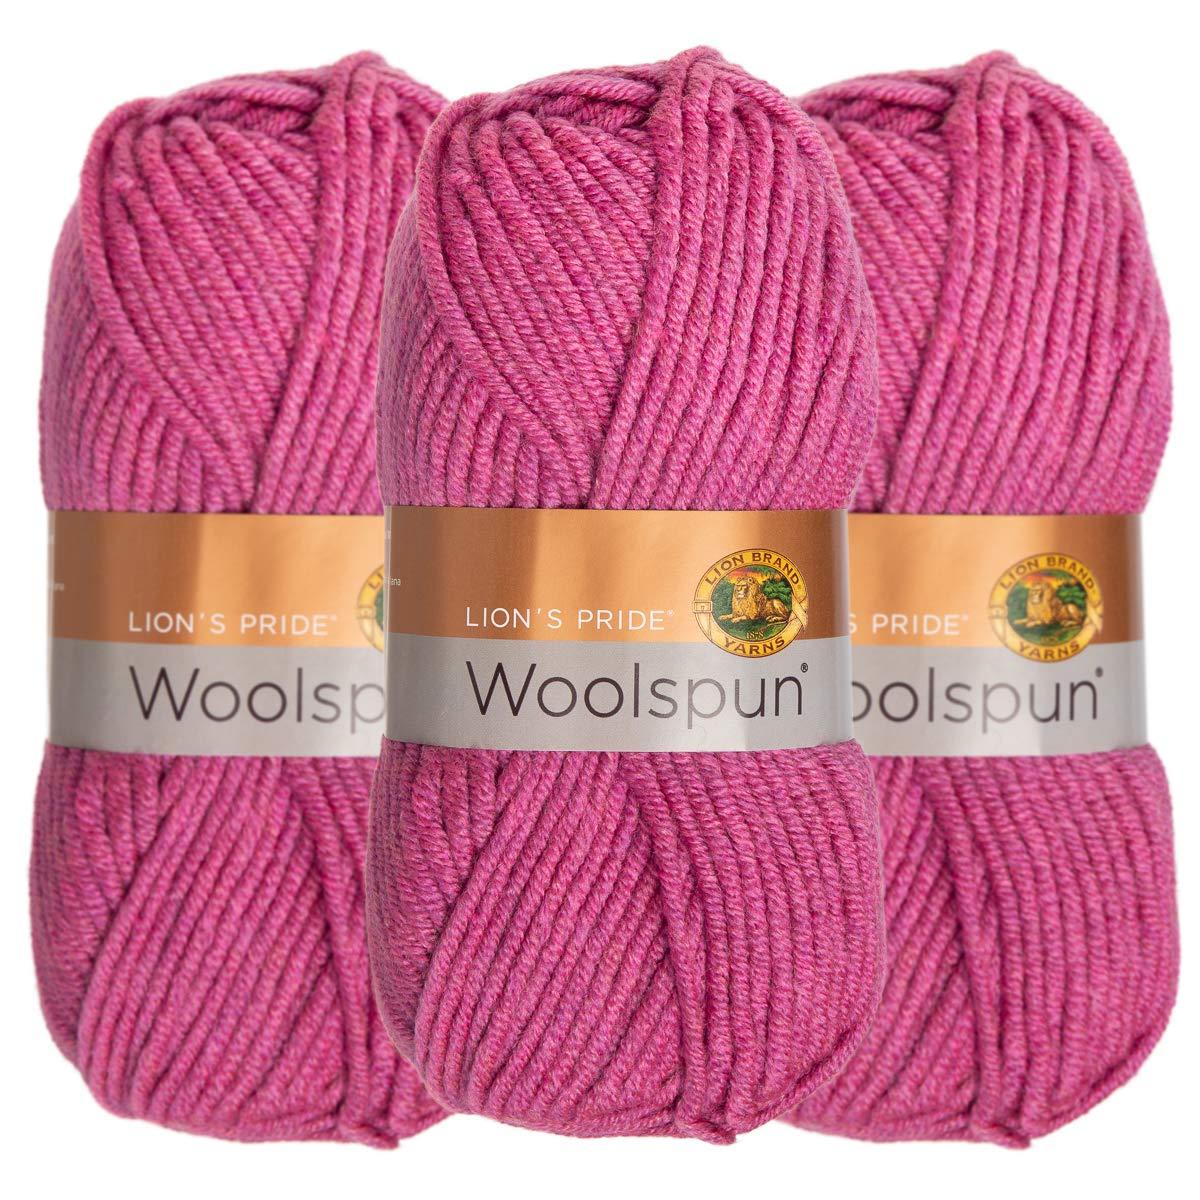 Lion Brand (3 Pack) Woolspun Acrylic & Wool Soft Coffee Brown Yarn for Knitting Crocheting Bulky #5